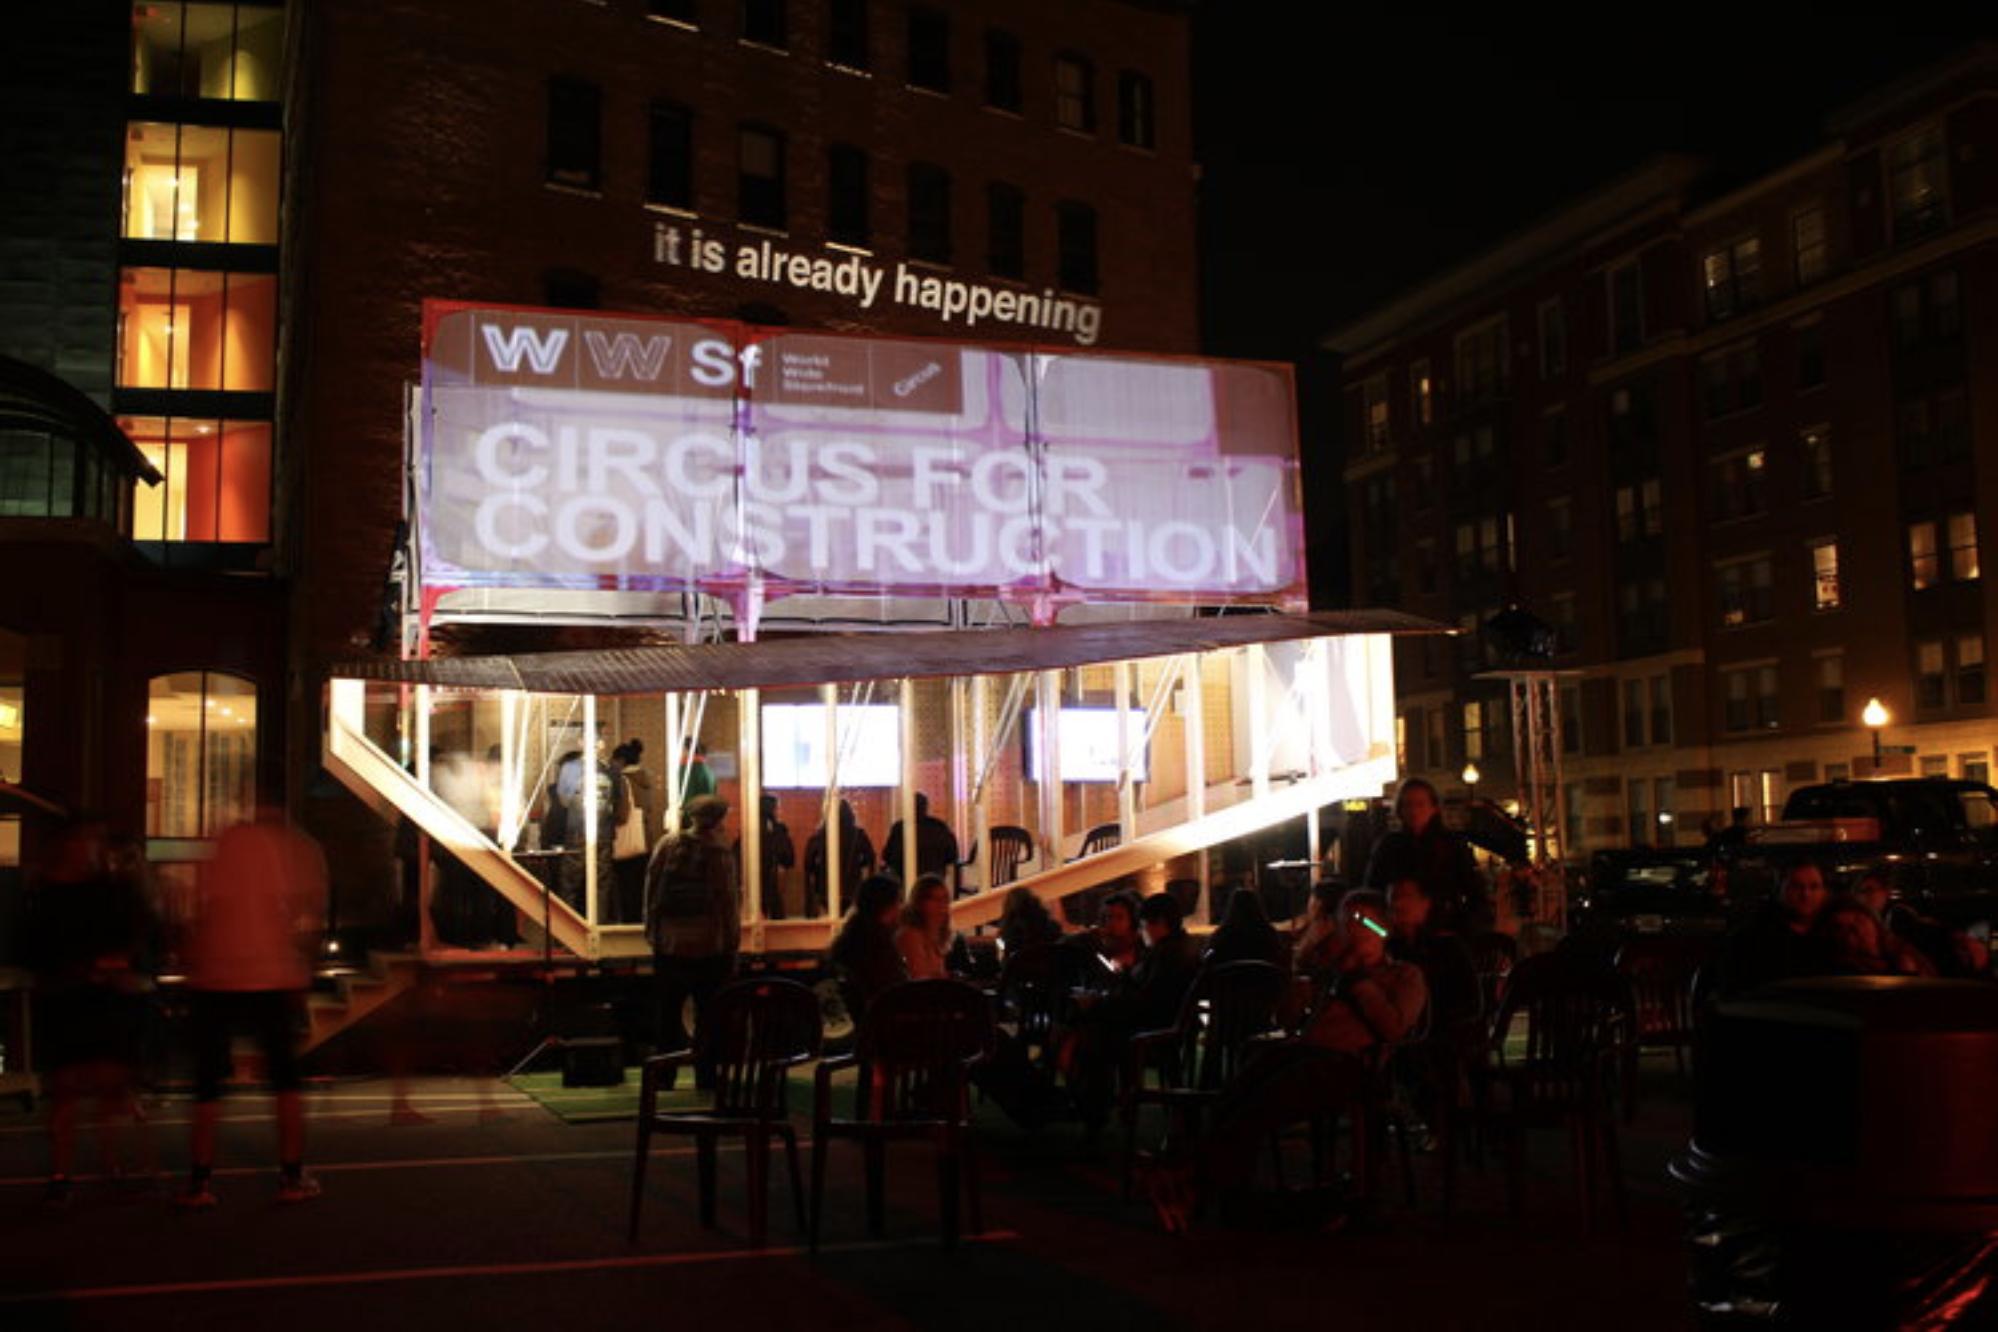 Circus for Construction_Ann Lui, Ashley Mendelsohn, Larisa Ovalles, Craig Reschke & Ben Widger_Illuminus 2014.png